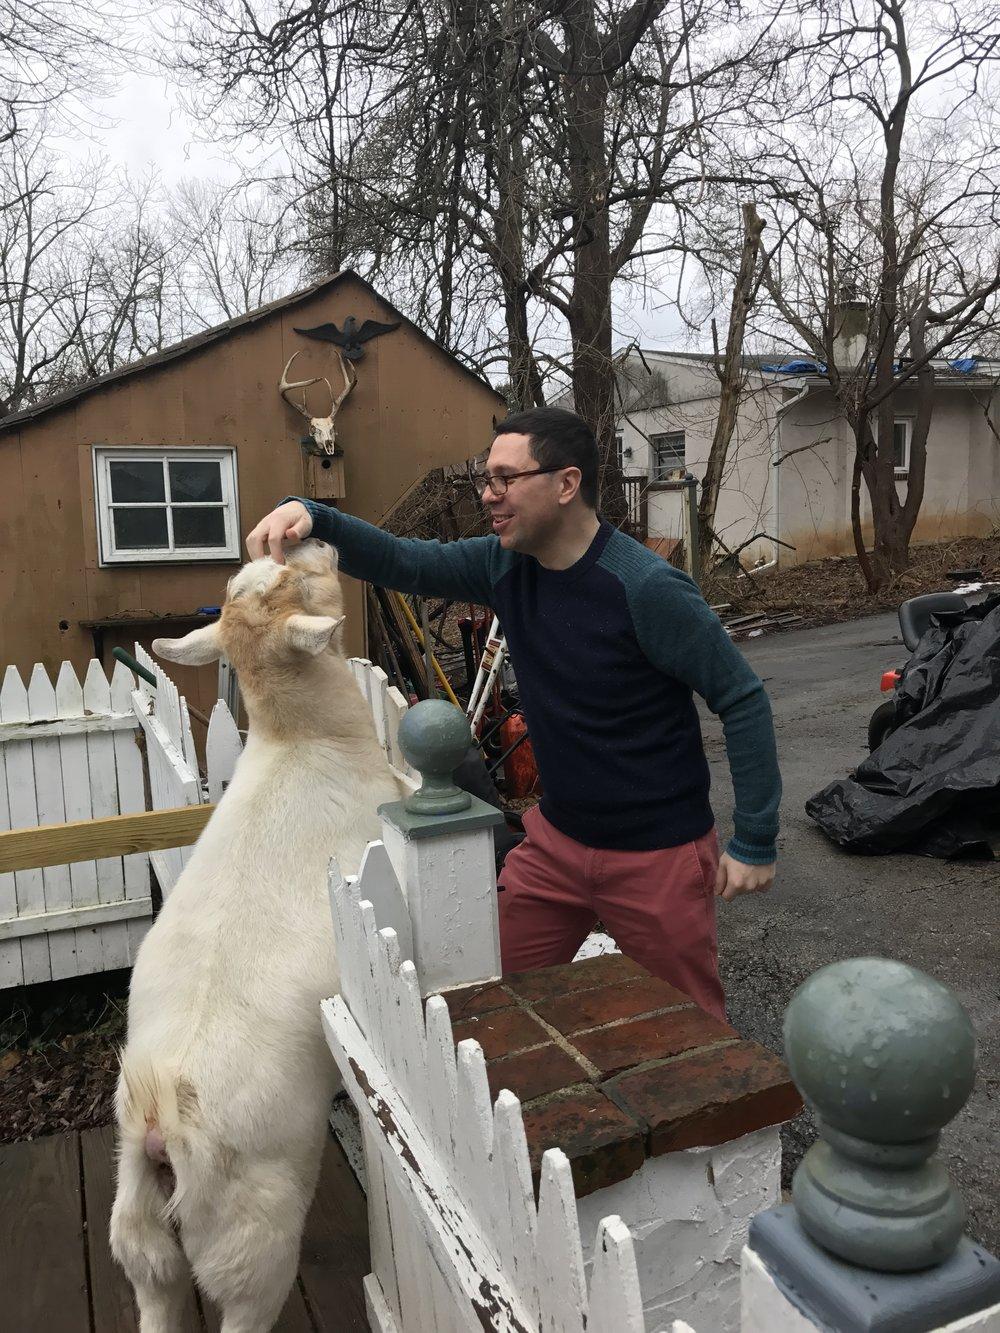 Capricorn, the mountain goat!